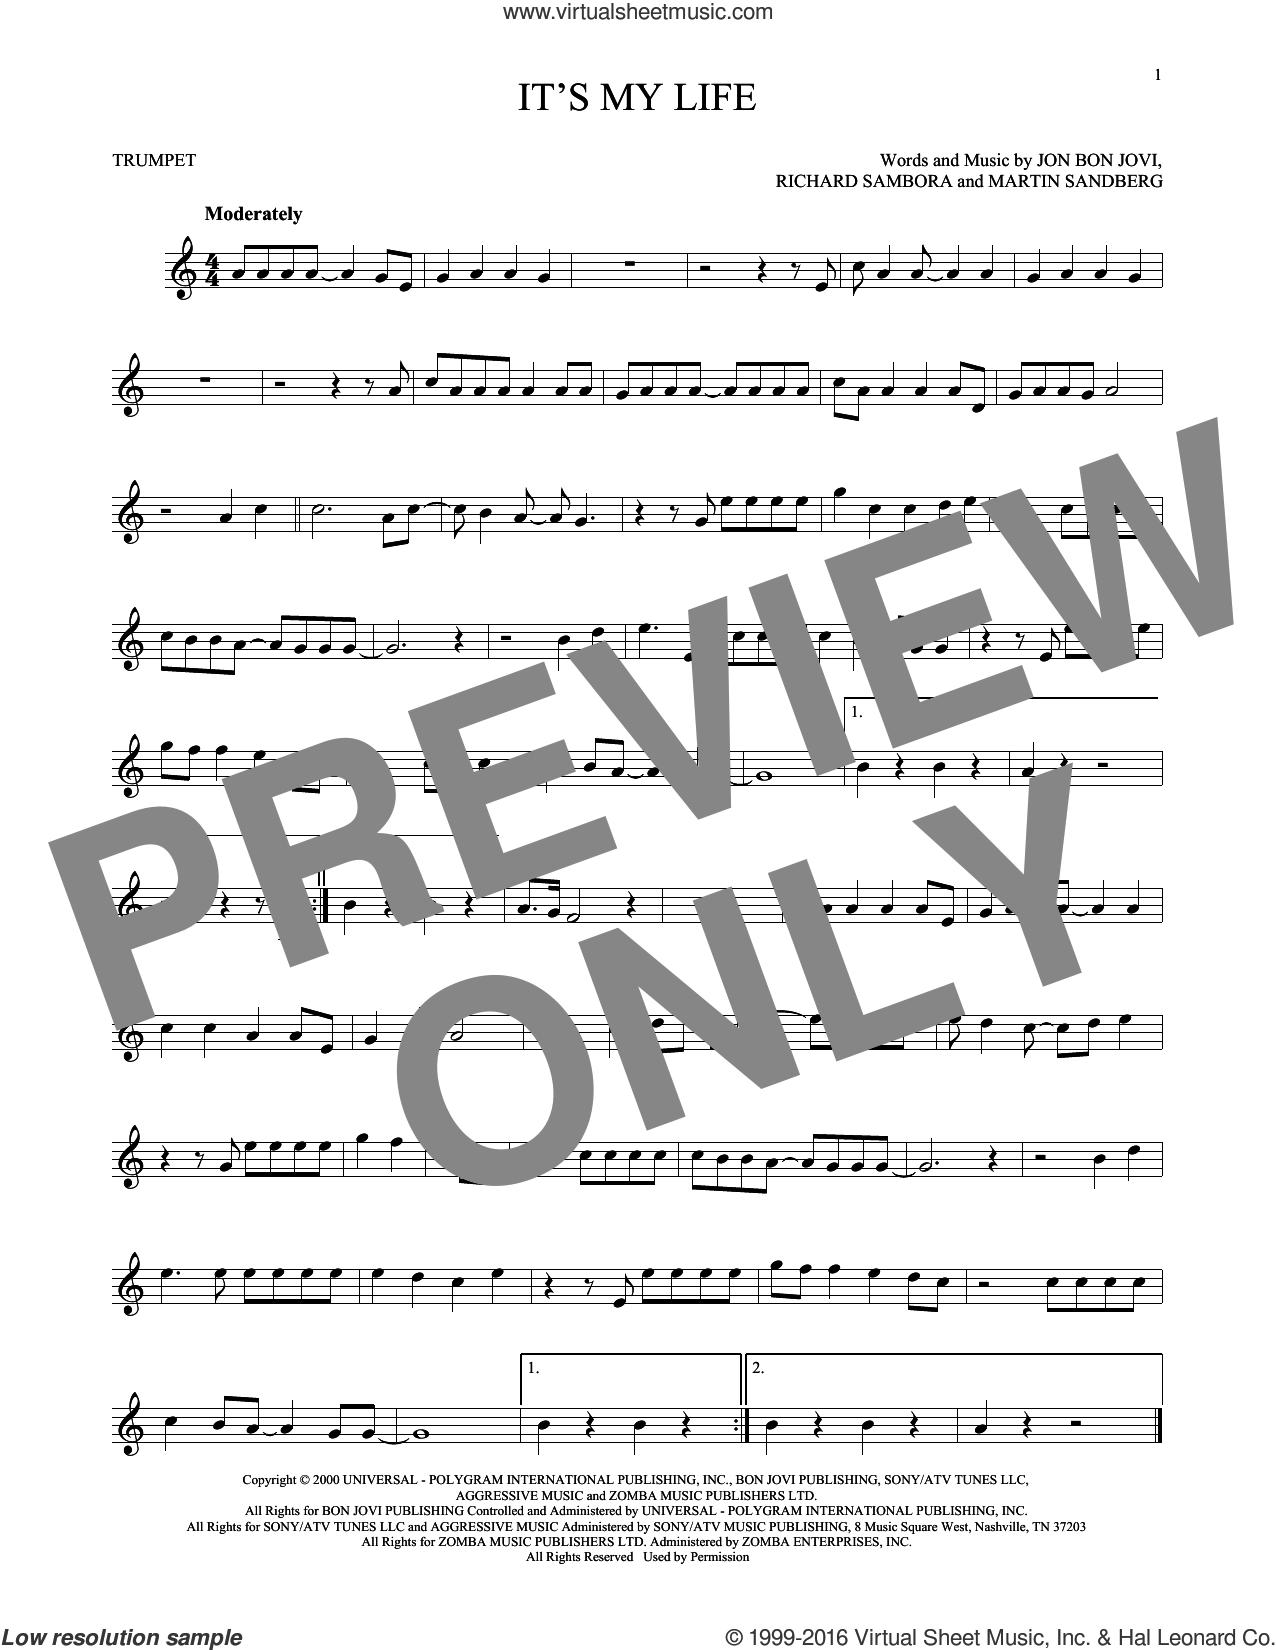 It's My Life sheet music for trumpet solo by Bon Jovi, Martin Sandberg and Richie Sambora, intermediate skill level